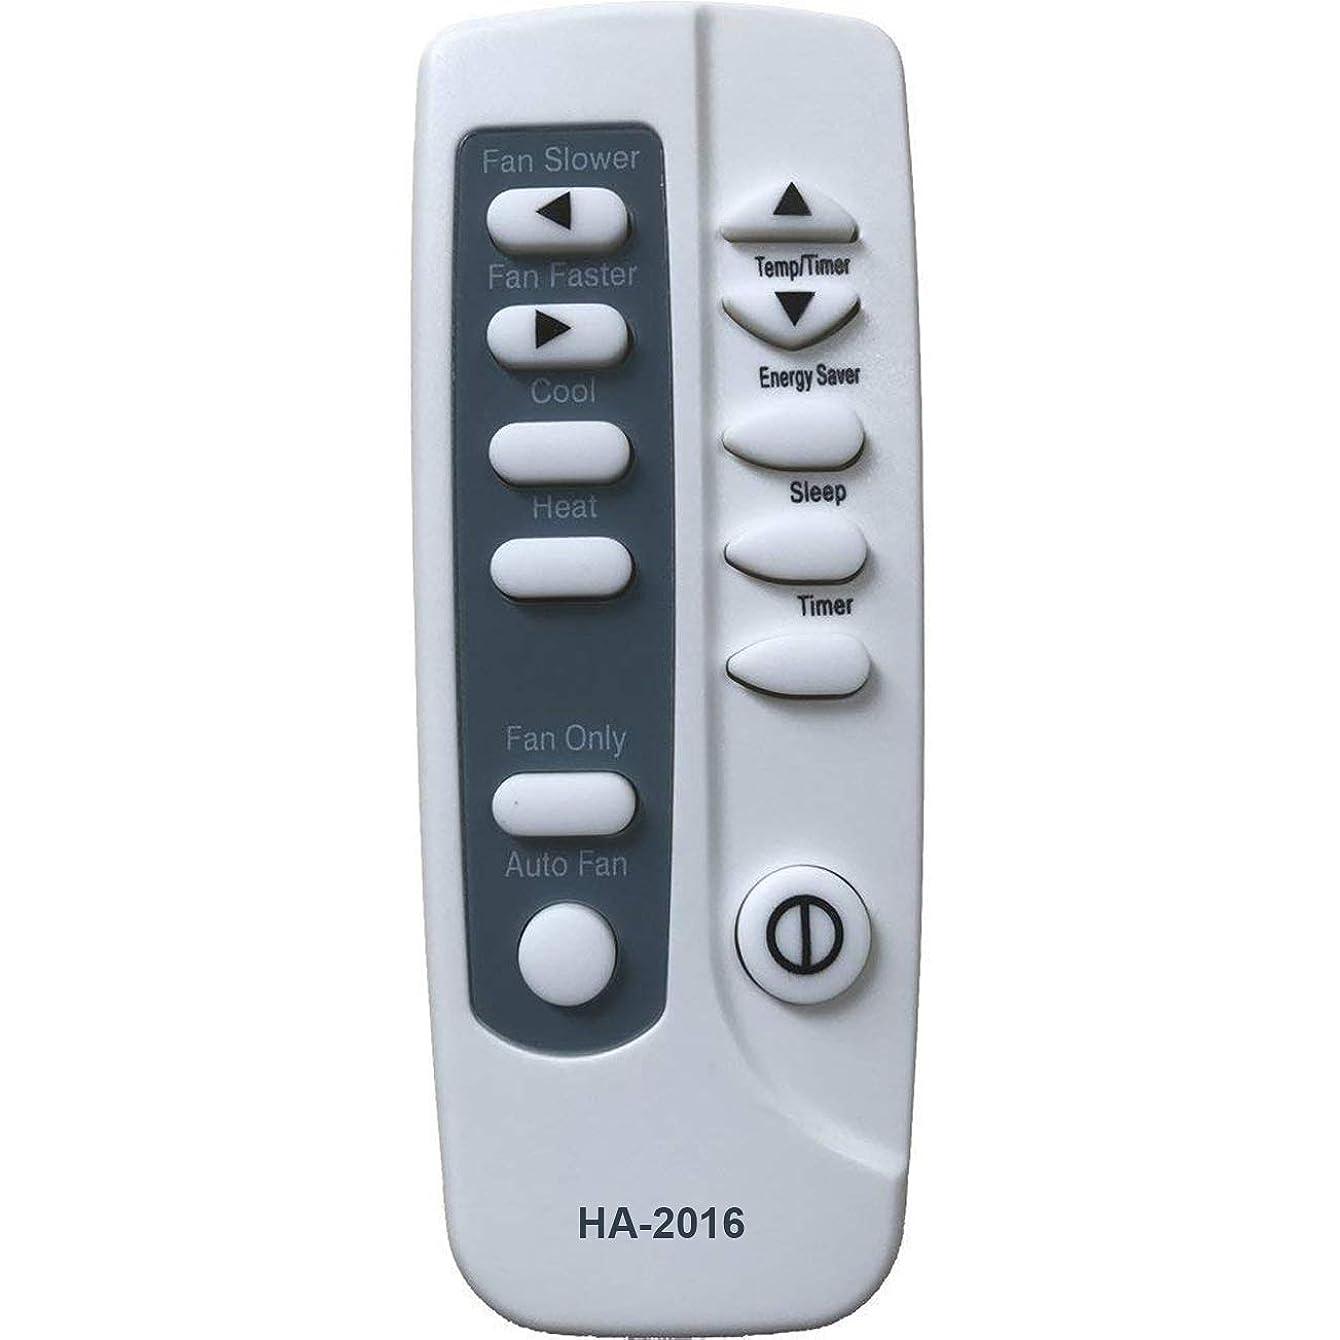 HA-2016 Replaces Frigidaire Air Conditioner Remote Control FFRE0633S1 FFA074S7A FAL125J1A3 FAH106R1T FRA065AT7 FFTA1233Q1 FAM18HR2A FFRE06L3Q1 LRA074AT7